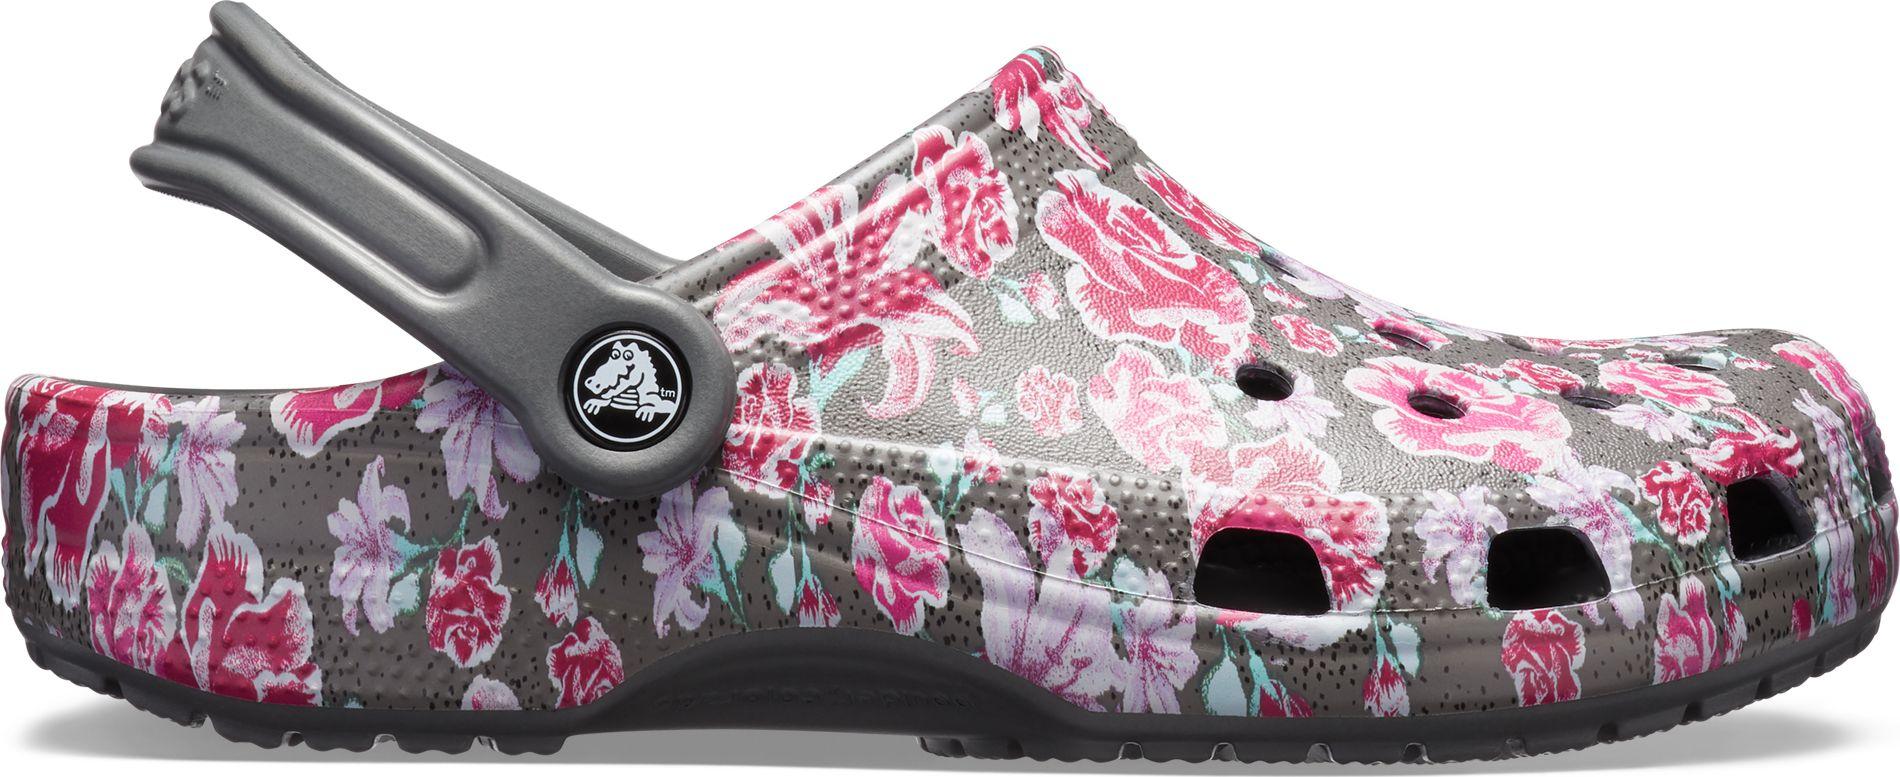 1b0a55988bf95 Crocs™ Classic Graphic II Clog Multi Floral Slate Grey ...